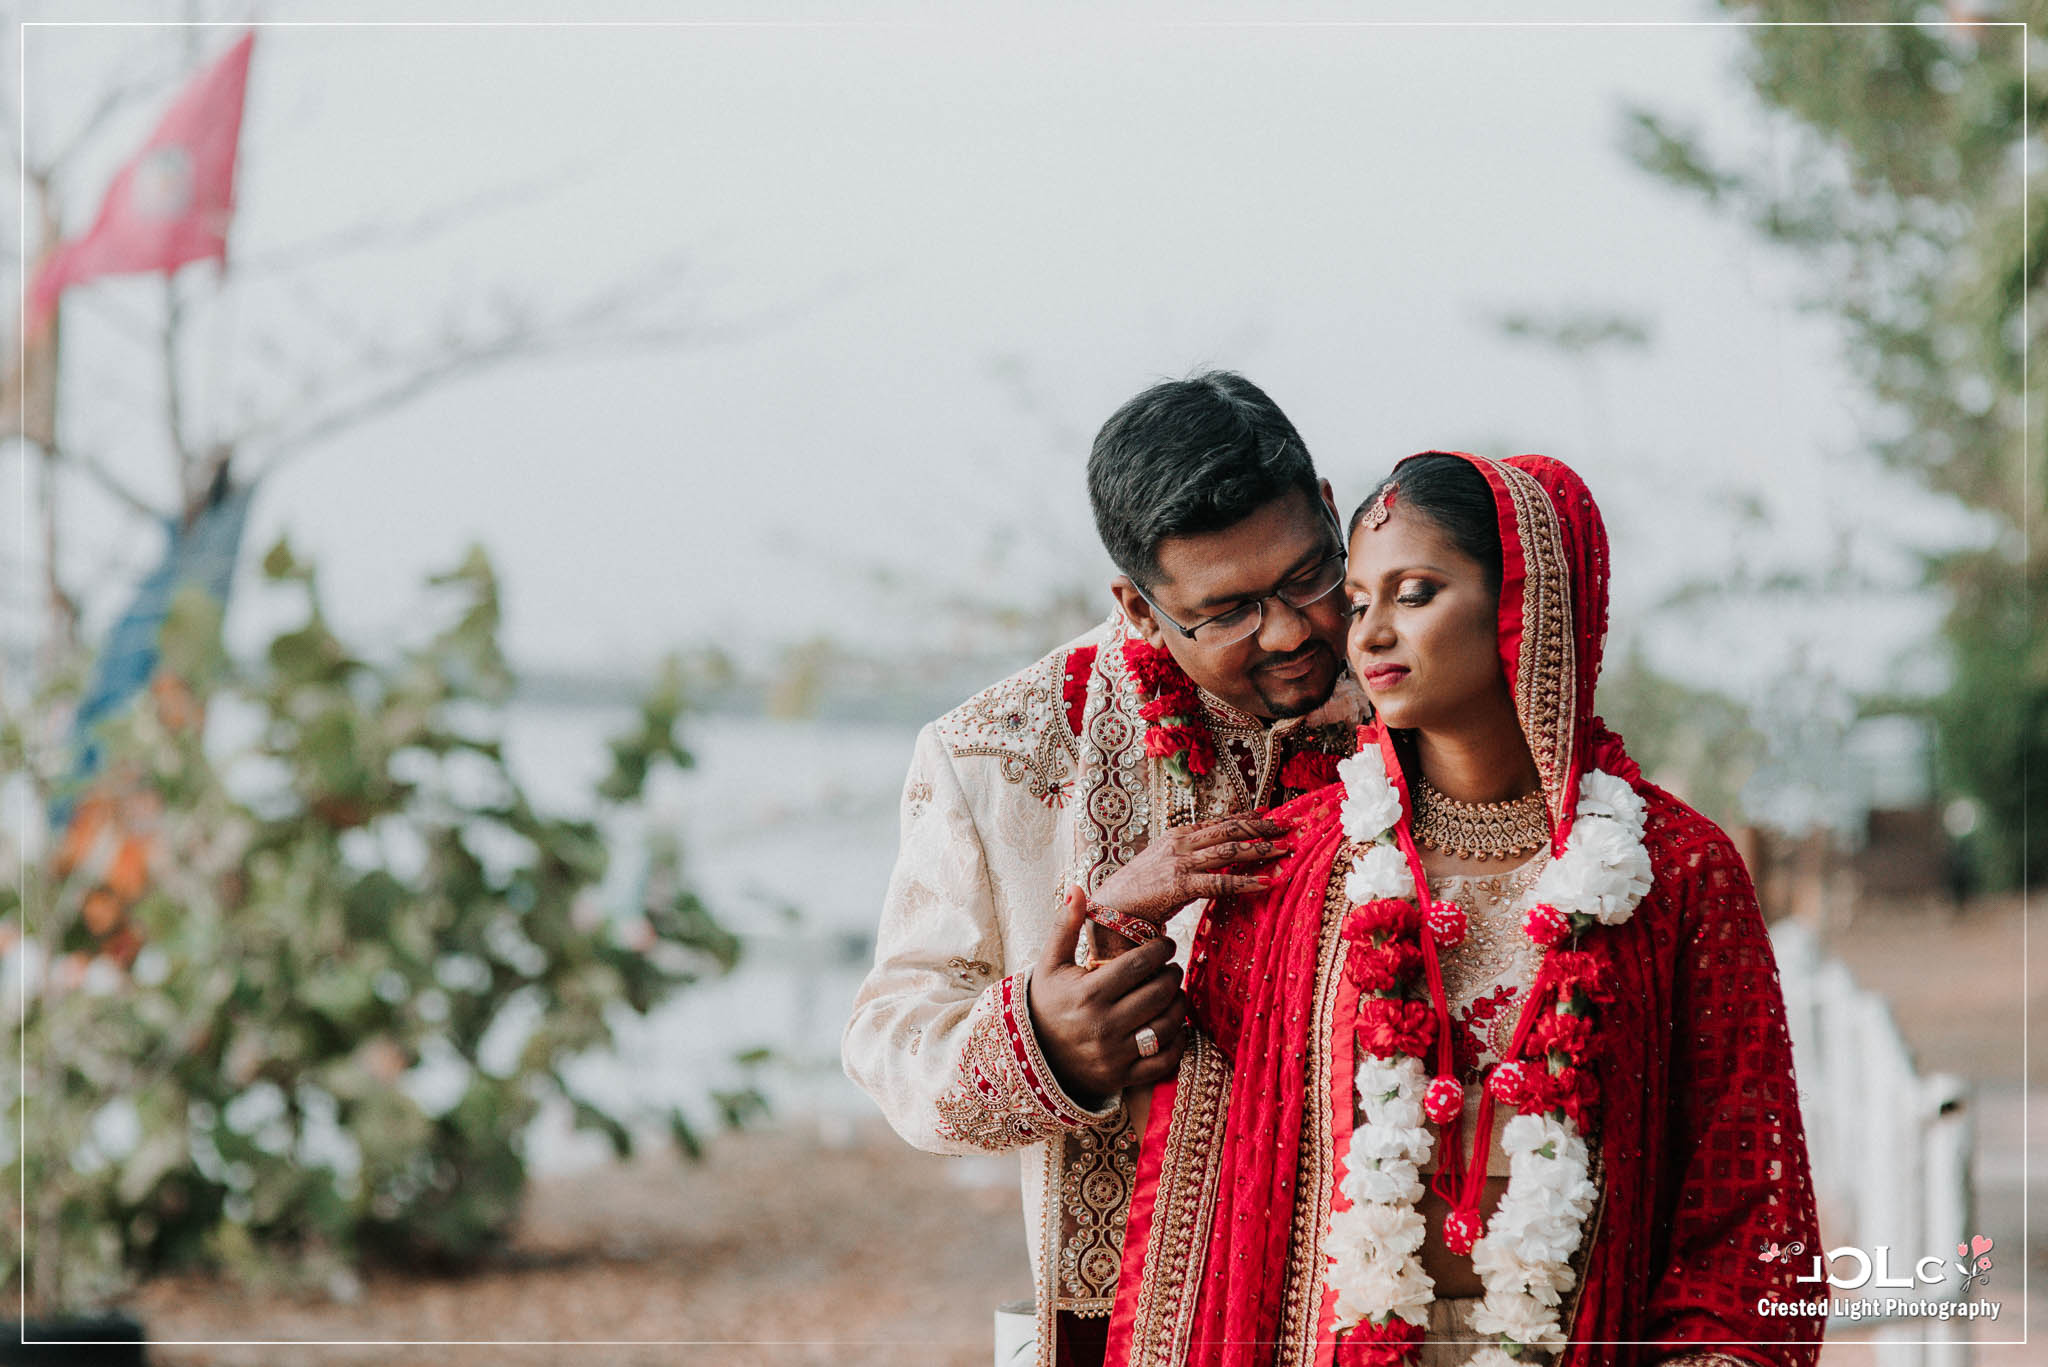 Temply by the Sea Waterloo Trinidad Hindu wedding 01.jpg